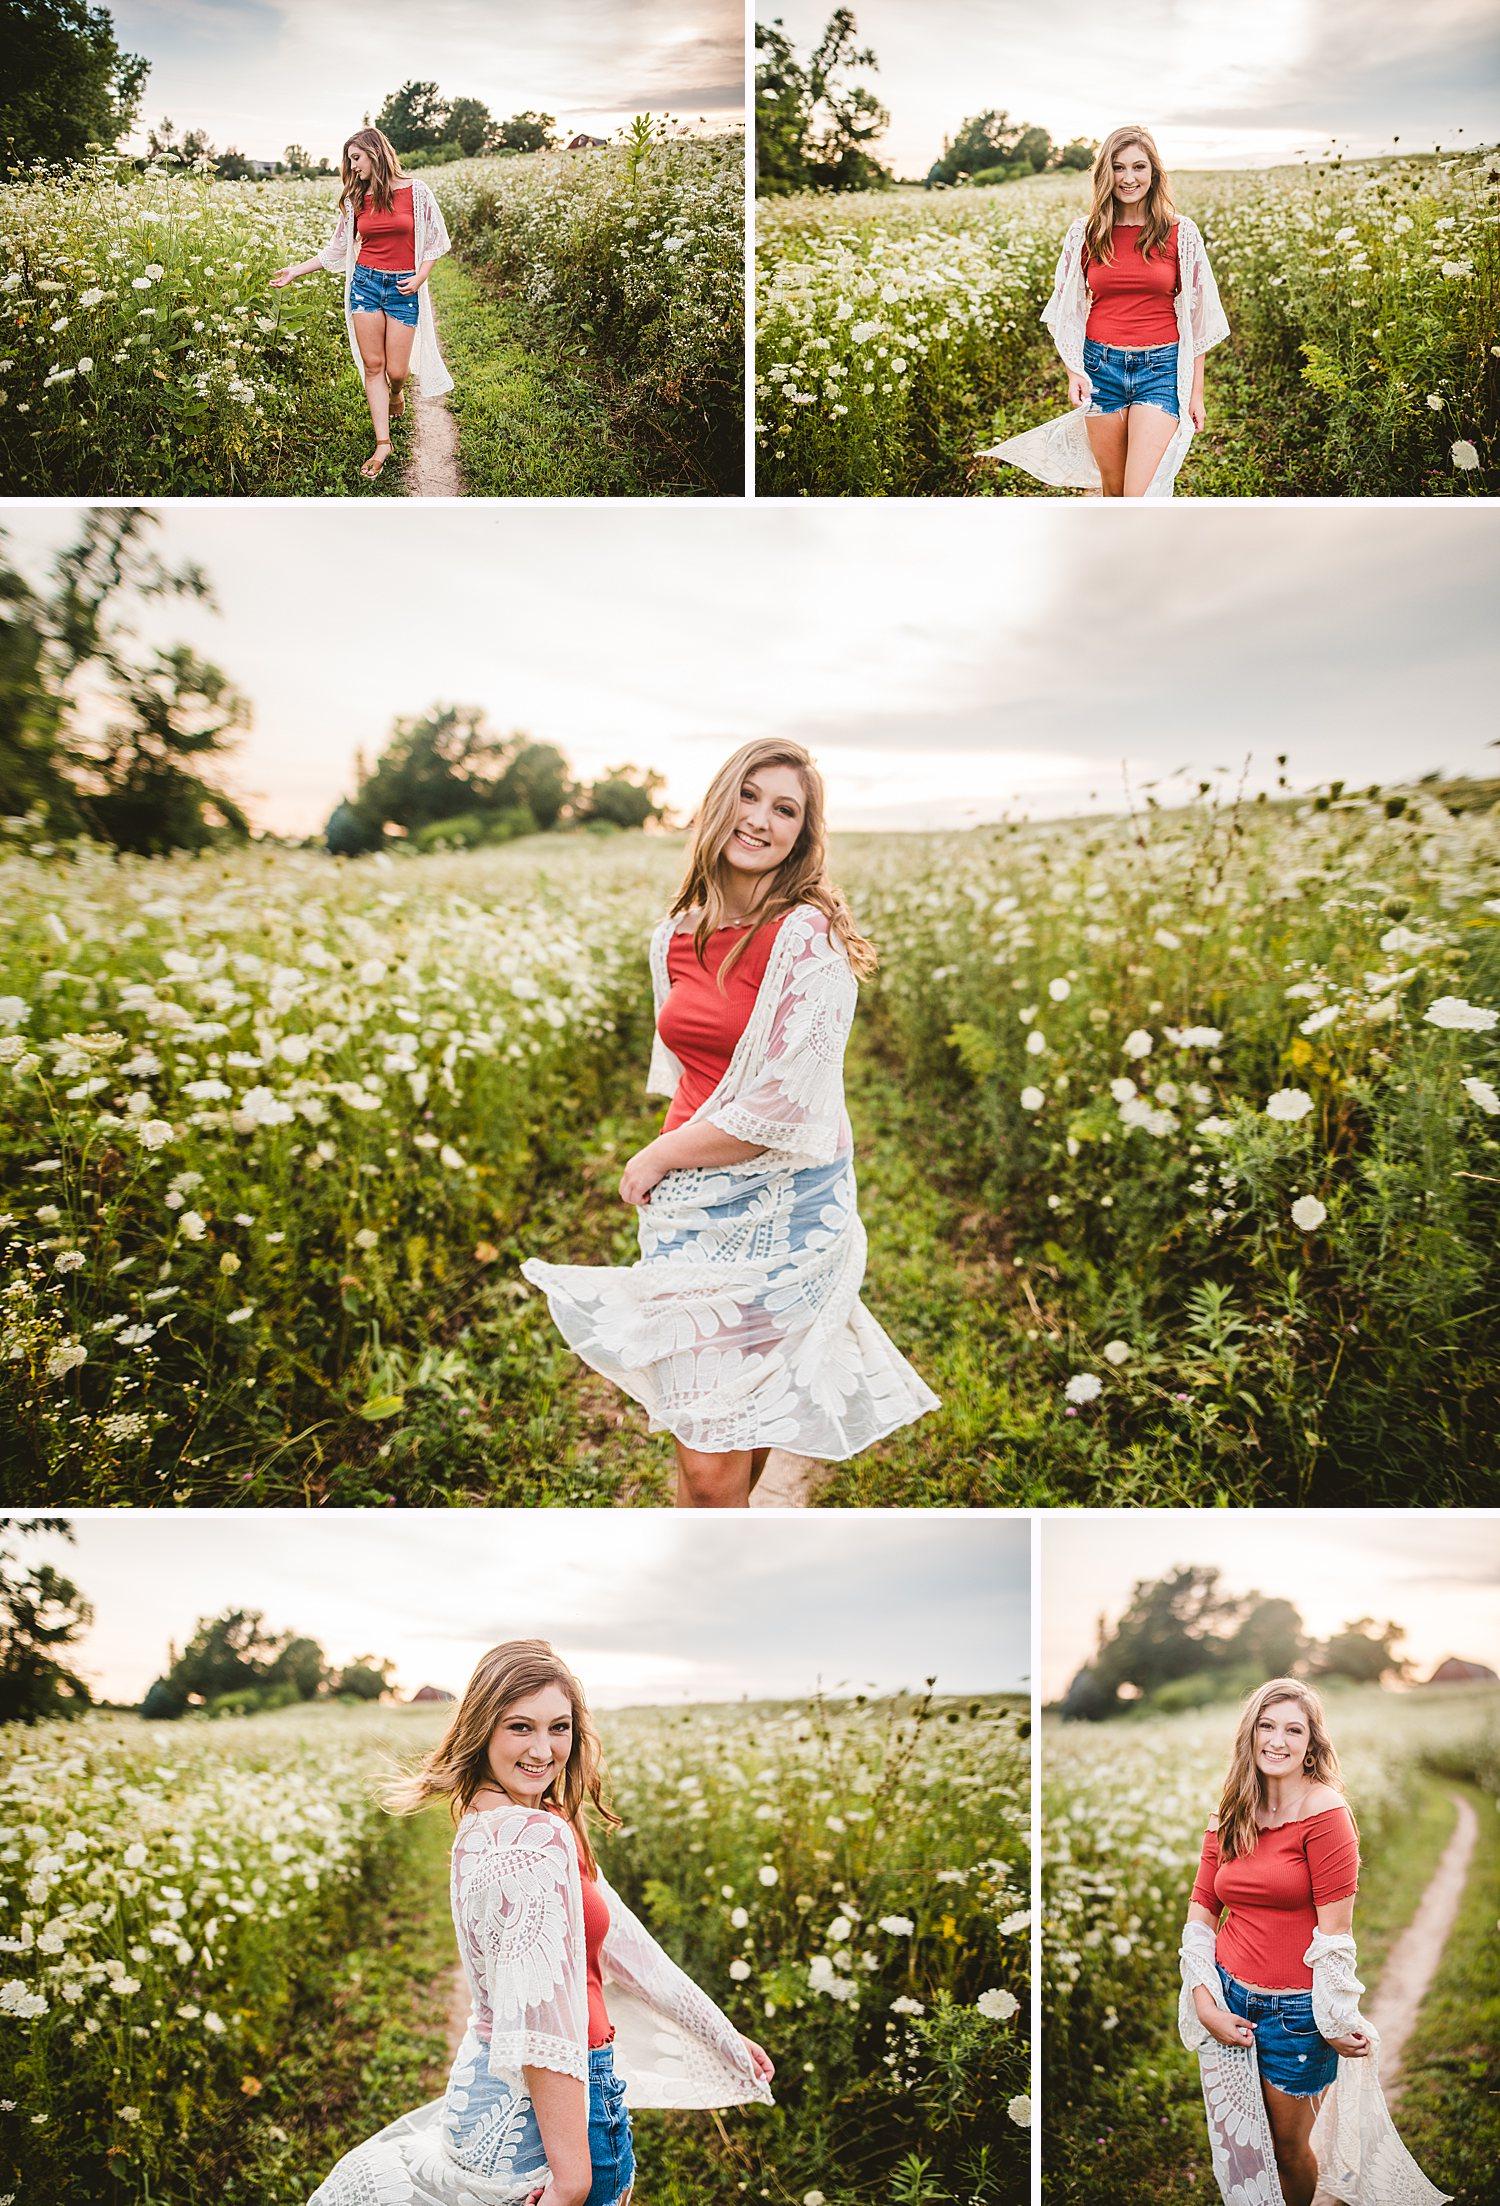 Grand Rapids Michigan - Senior Photographers - Jewel 34.jpg